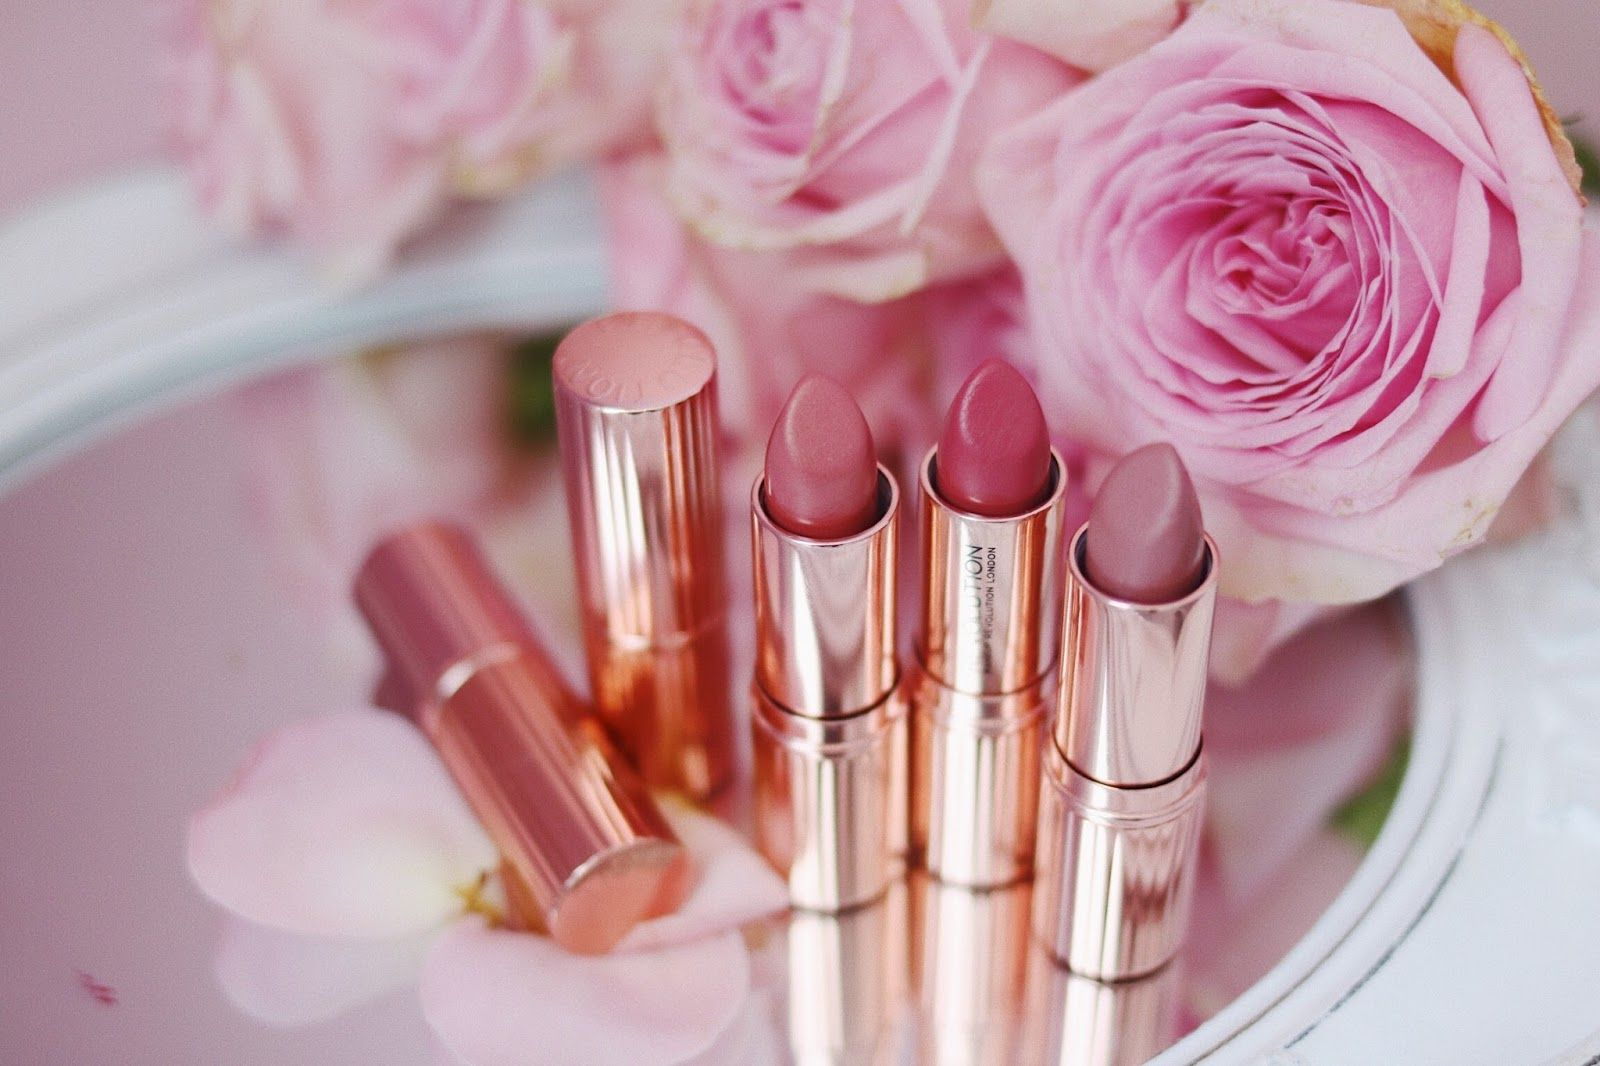 Renaissance Lipsticks de Makeup Revolution London , la